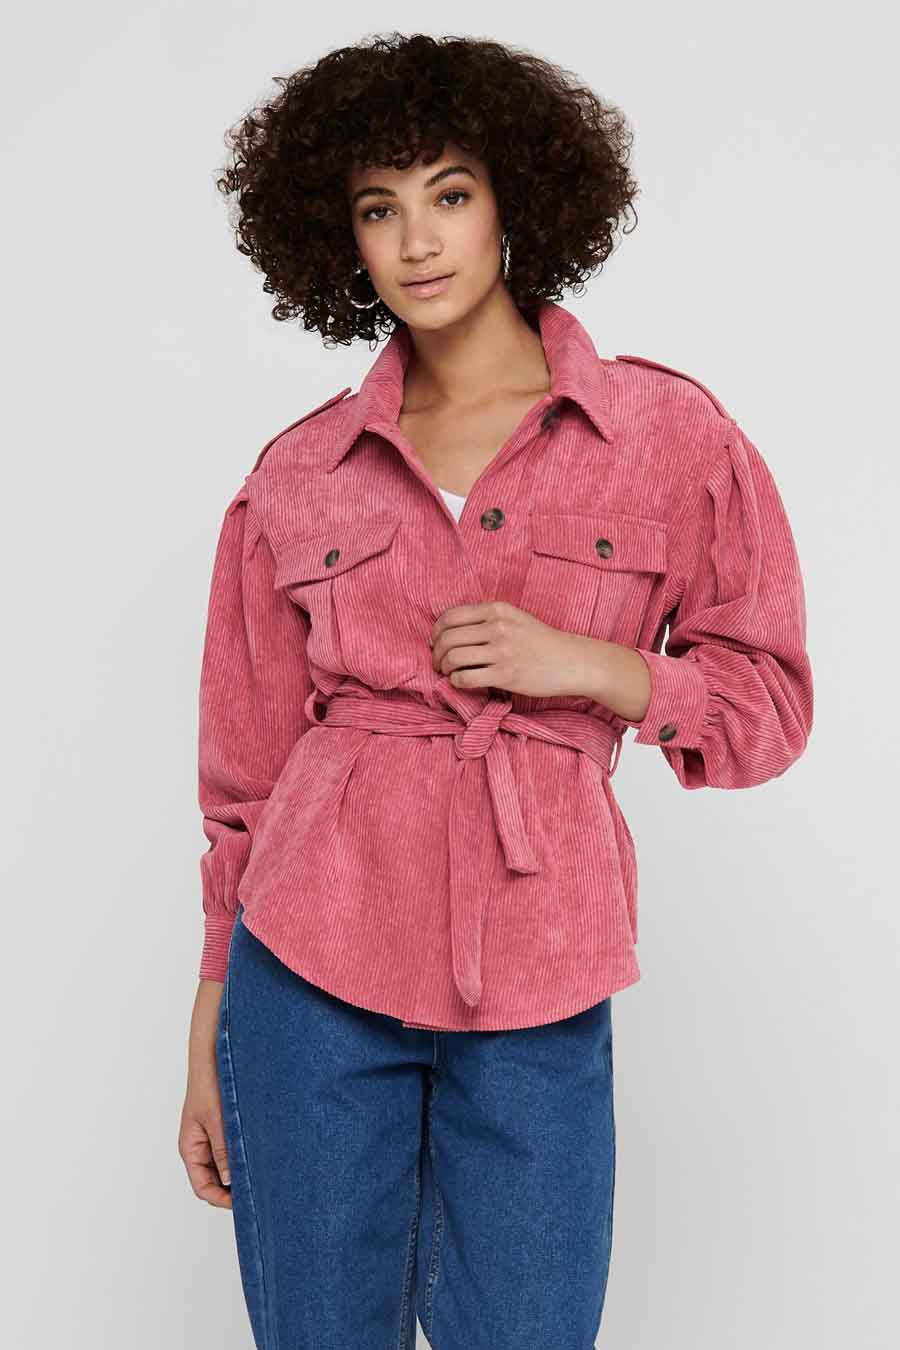 ONLY® Blazer, Roze, Dames, Maat: L/M/S